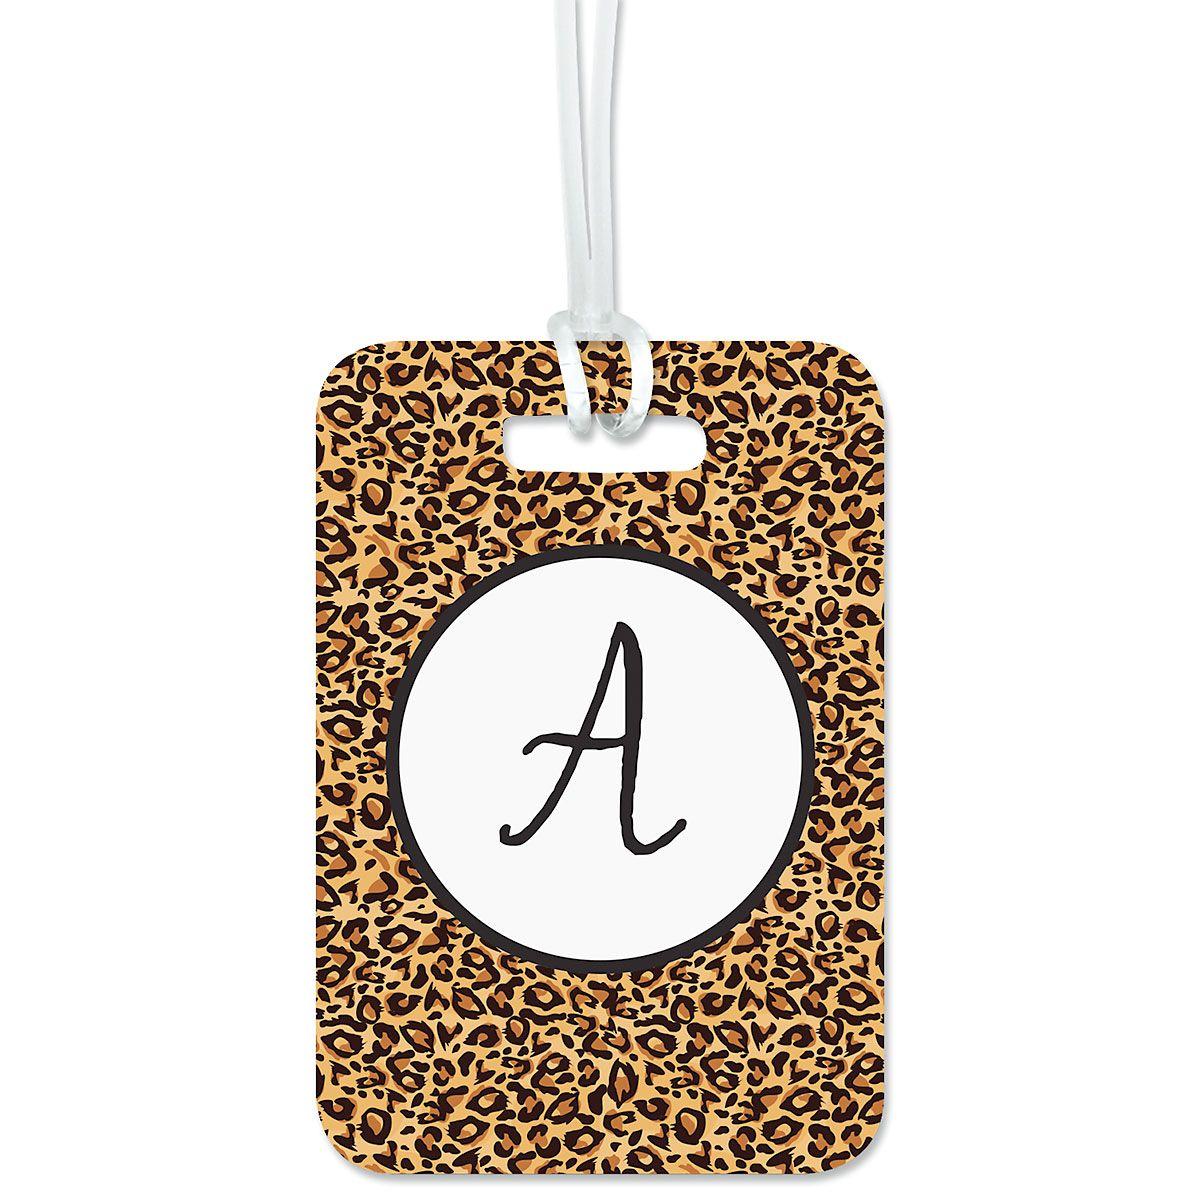 Cheetah Print Luggage Tag